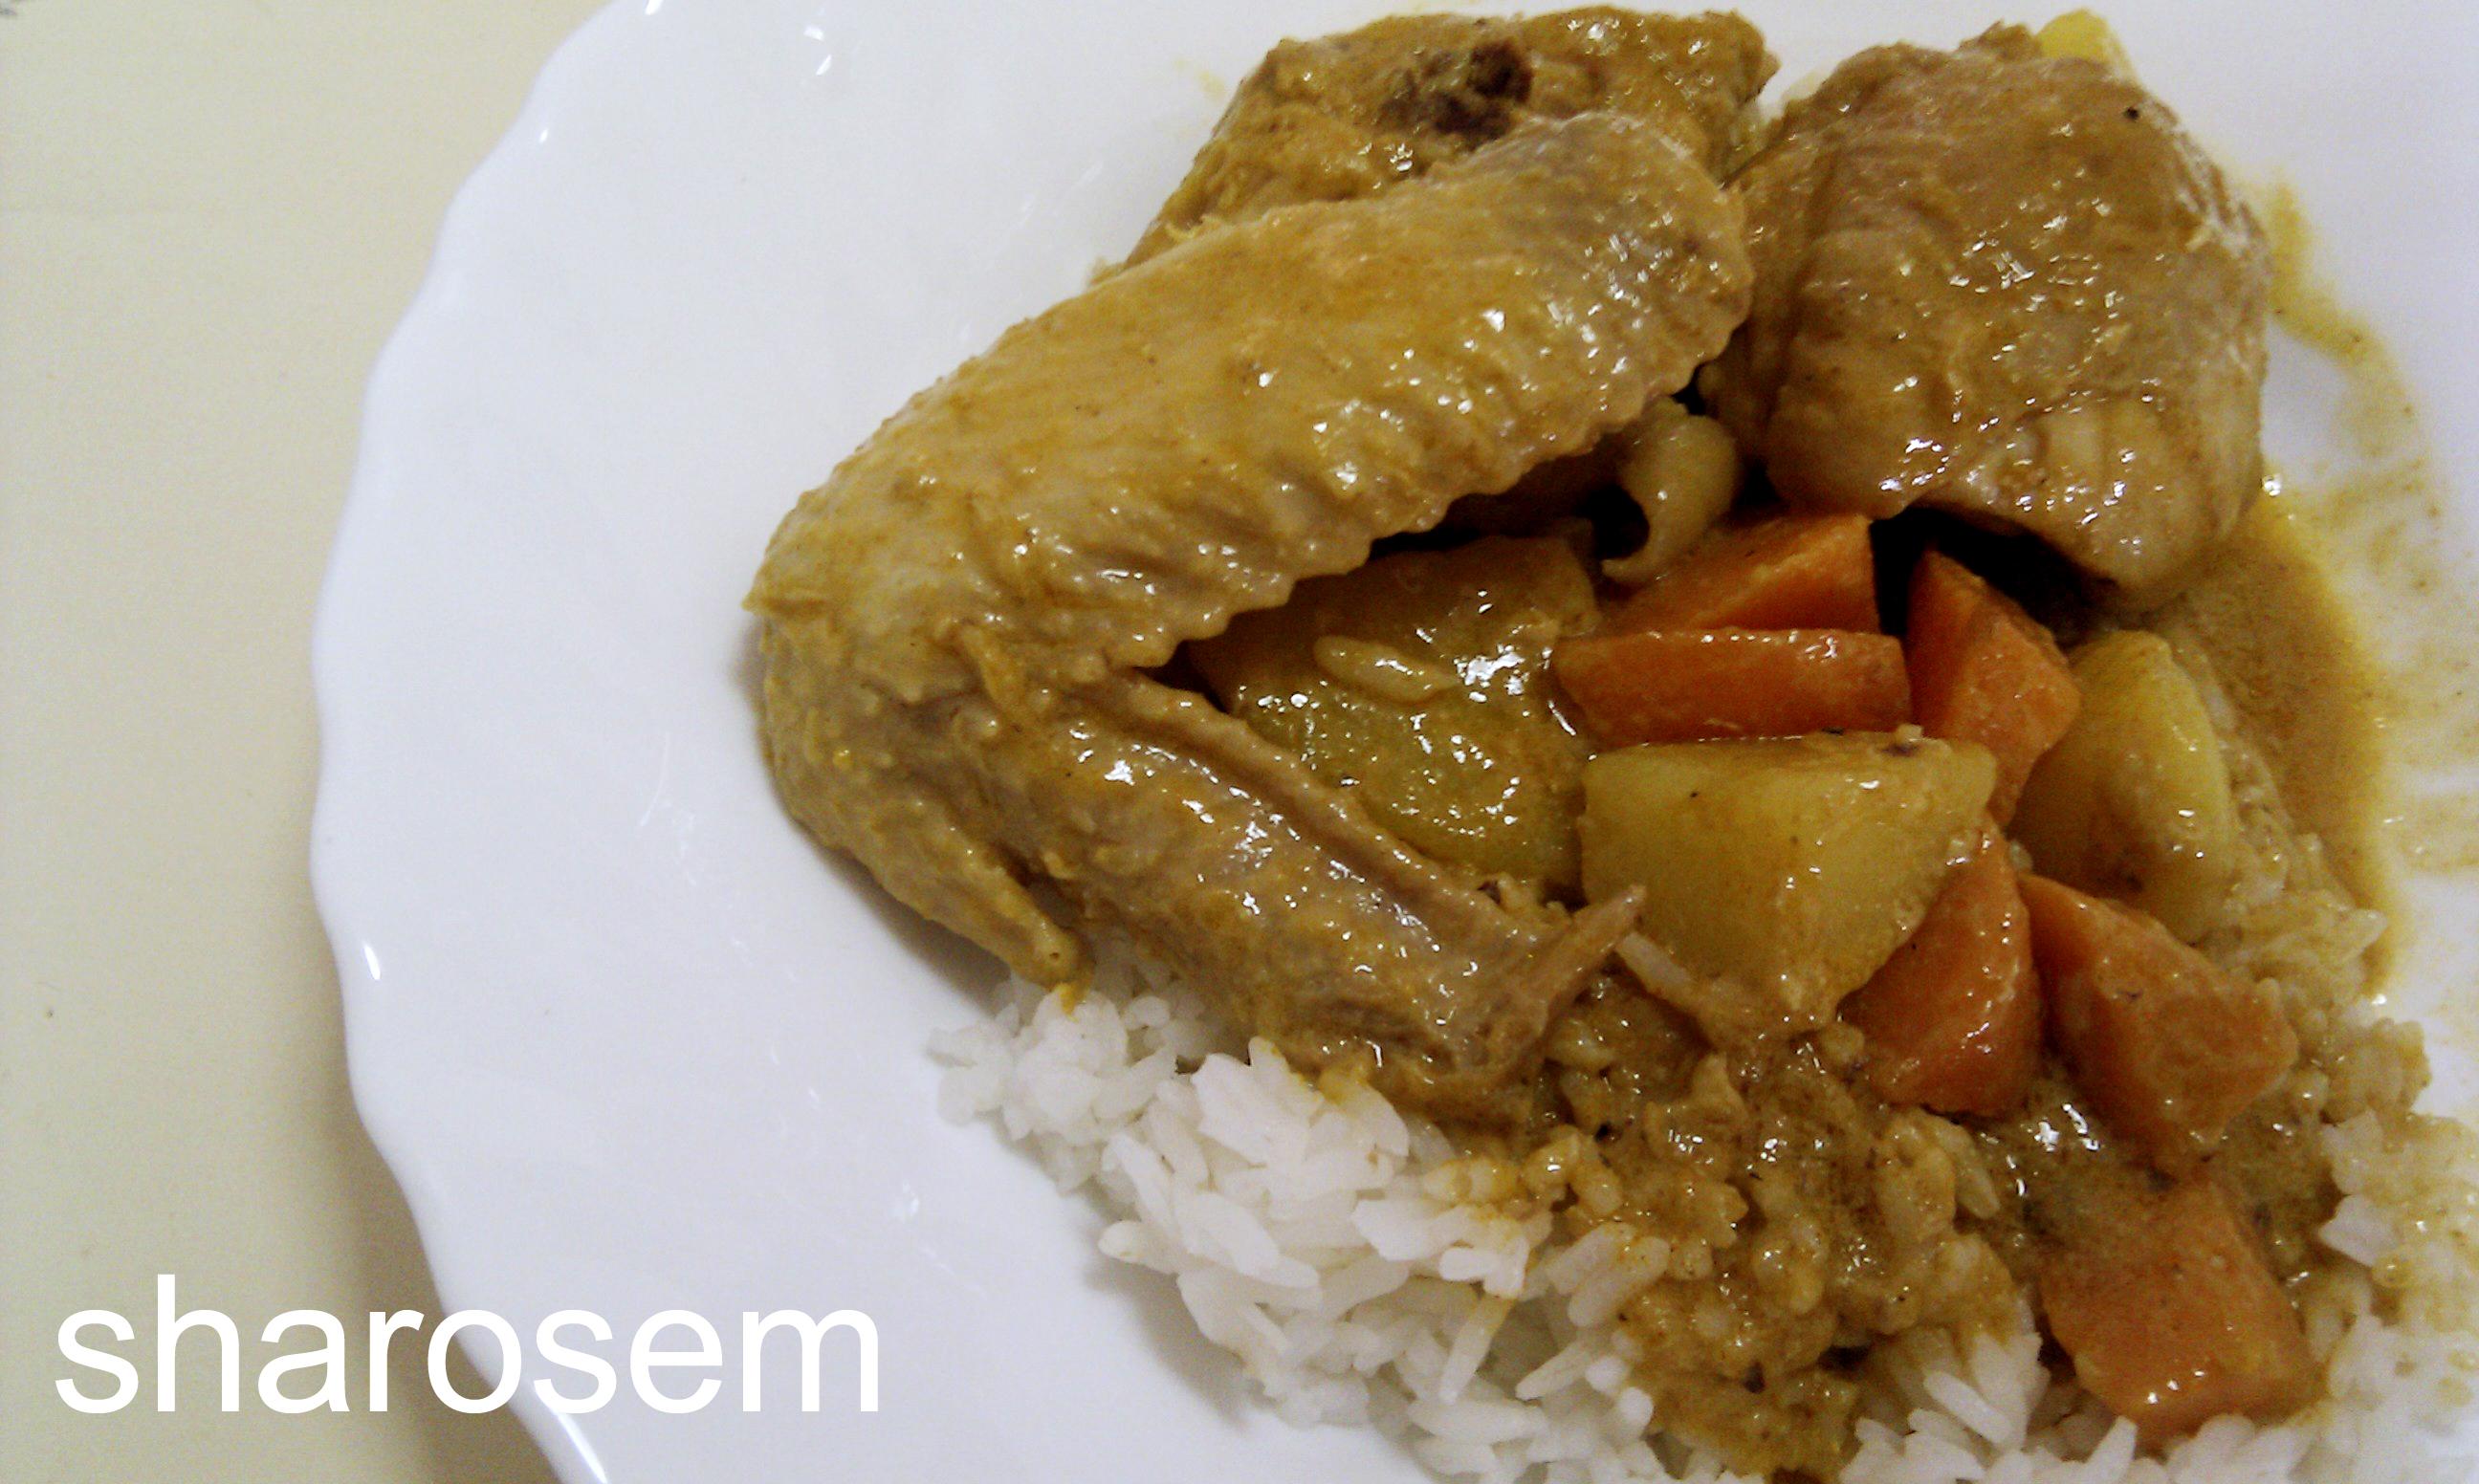 Myfresha licious chicken curry filipino style chicken curry filipino style for forumfinder Gallery